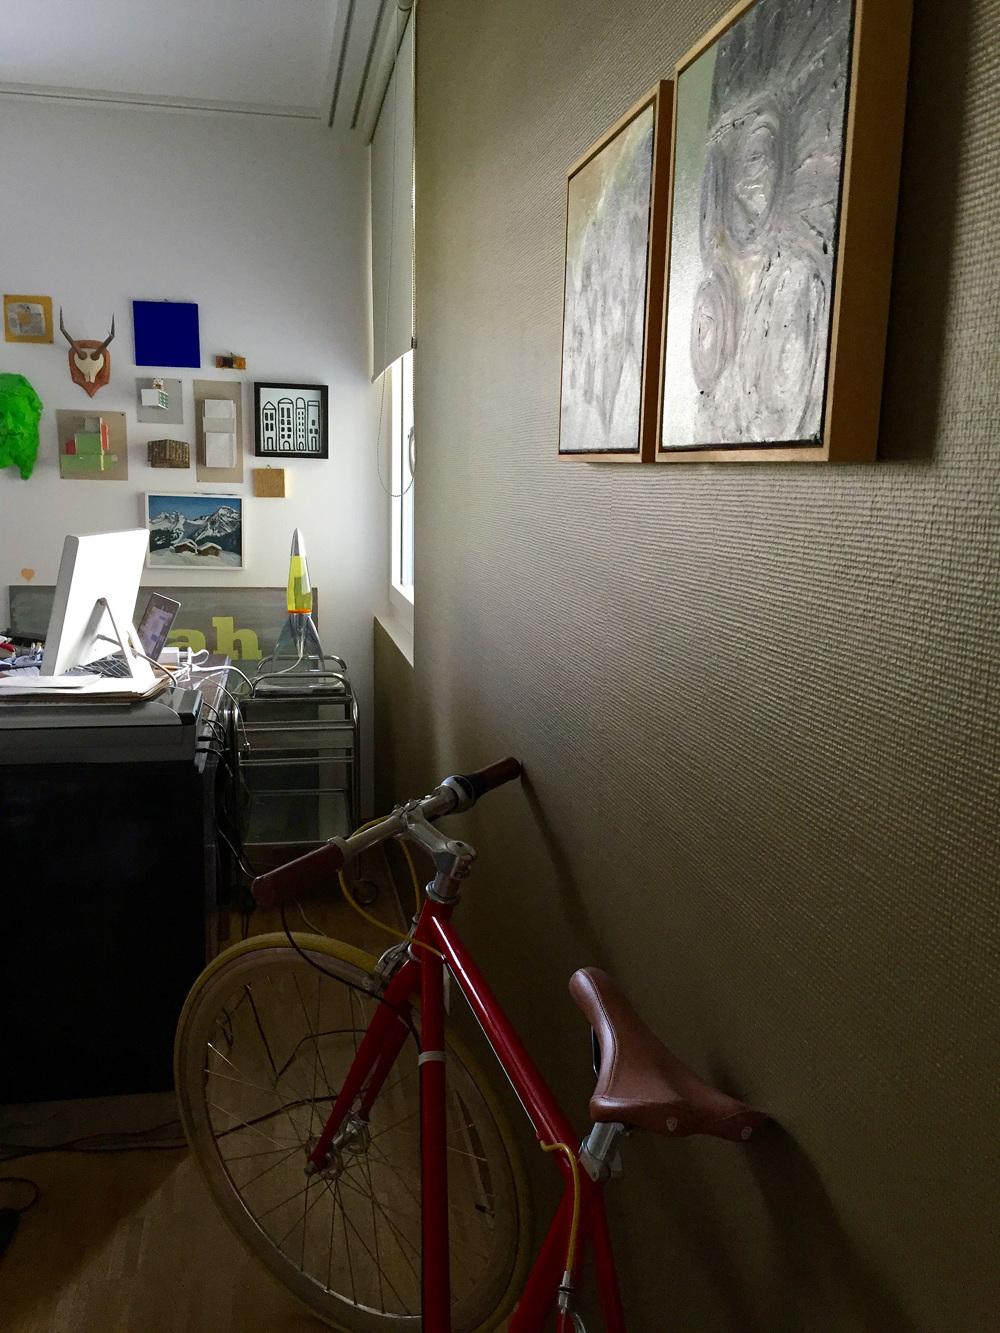 portrait hohl und fry farbgestalter gmbh. Black Bedroom Furniture Sets. Home Design Ideas